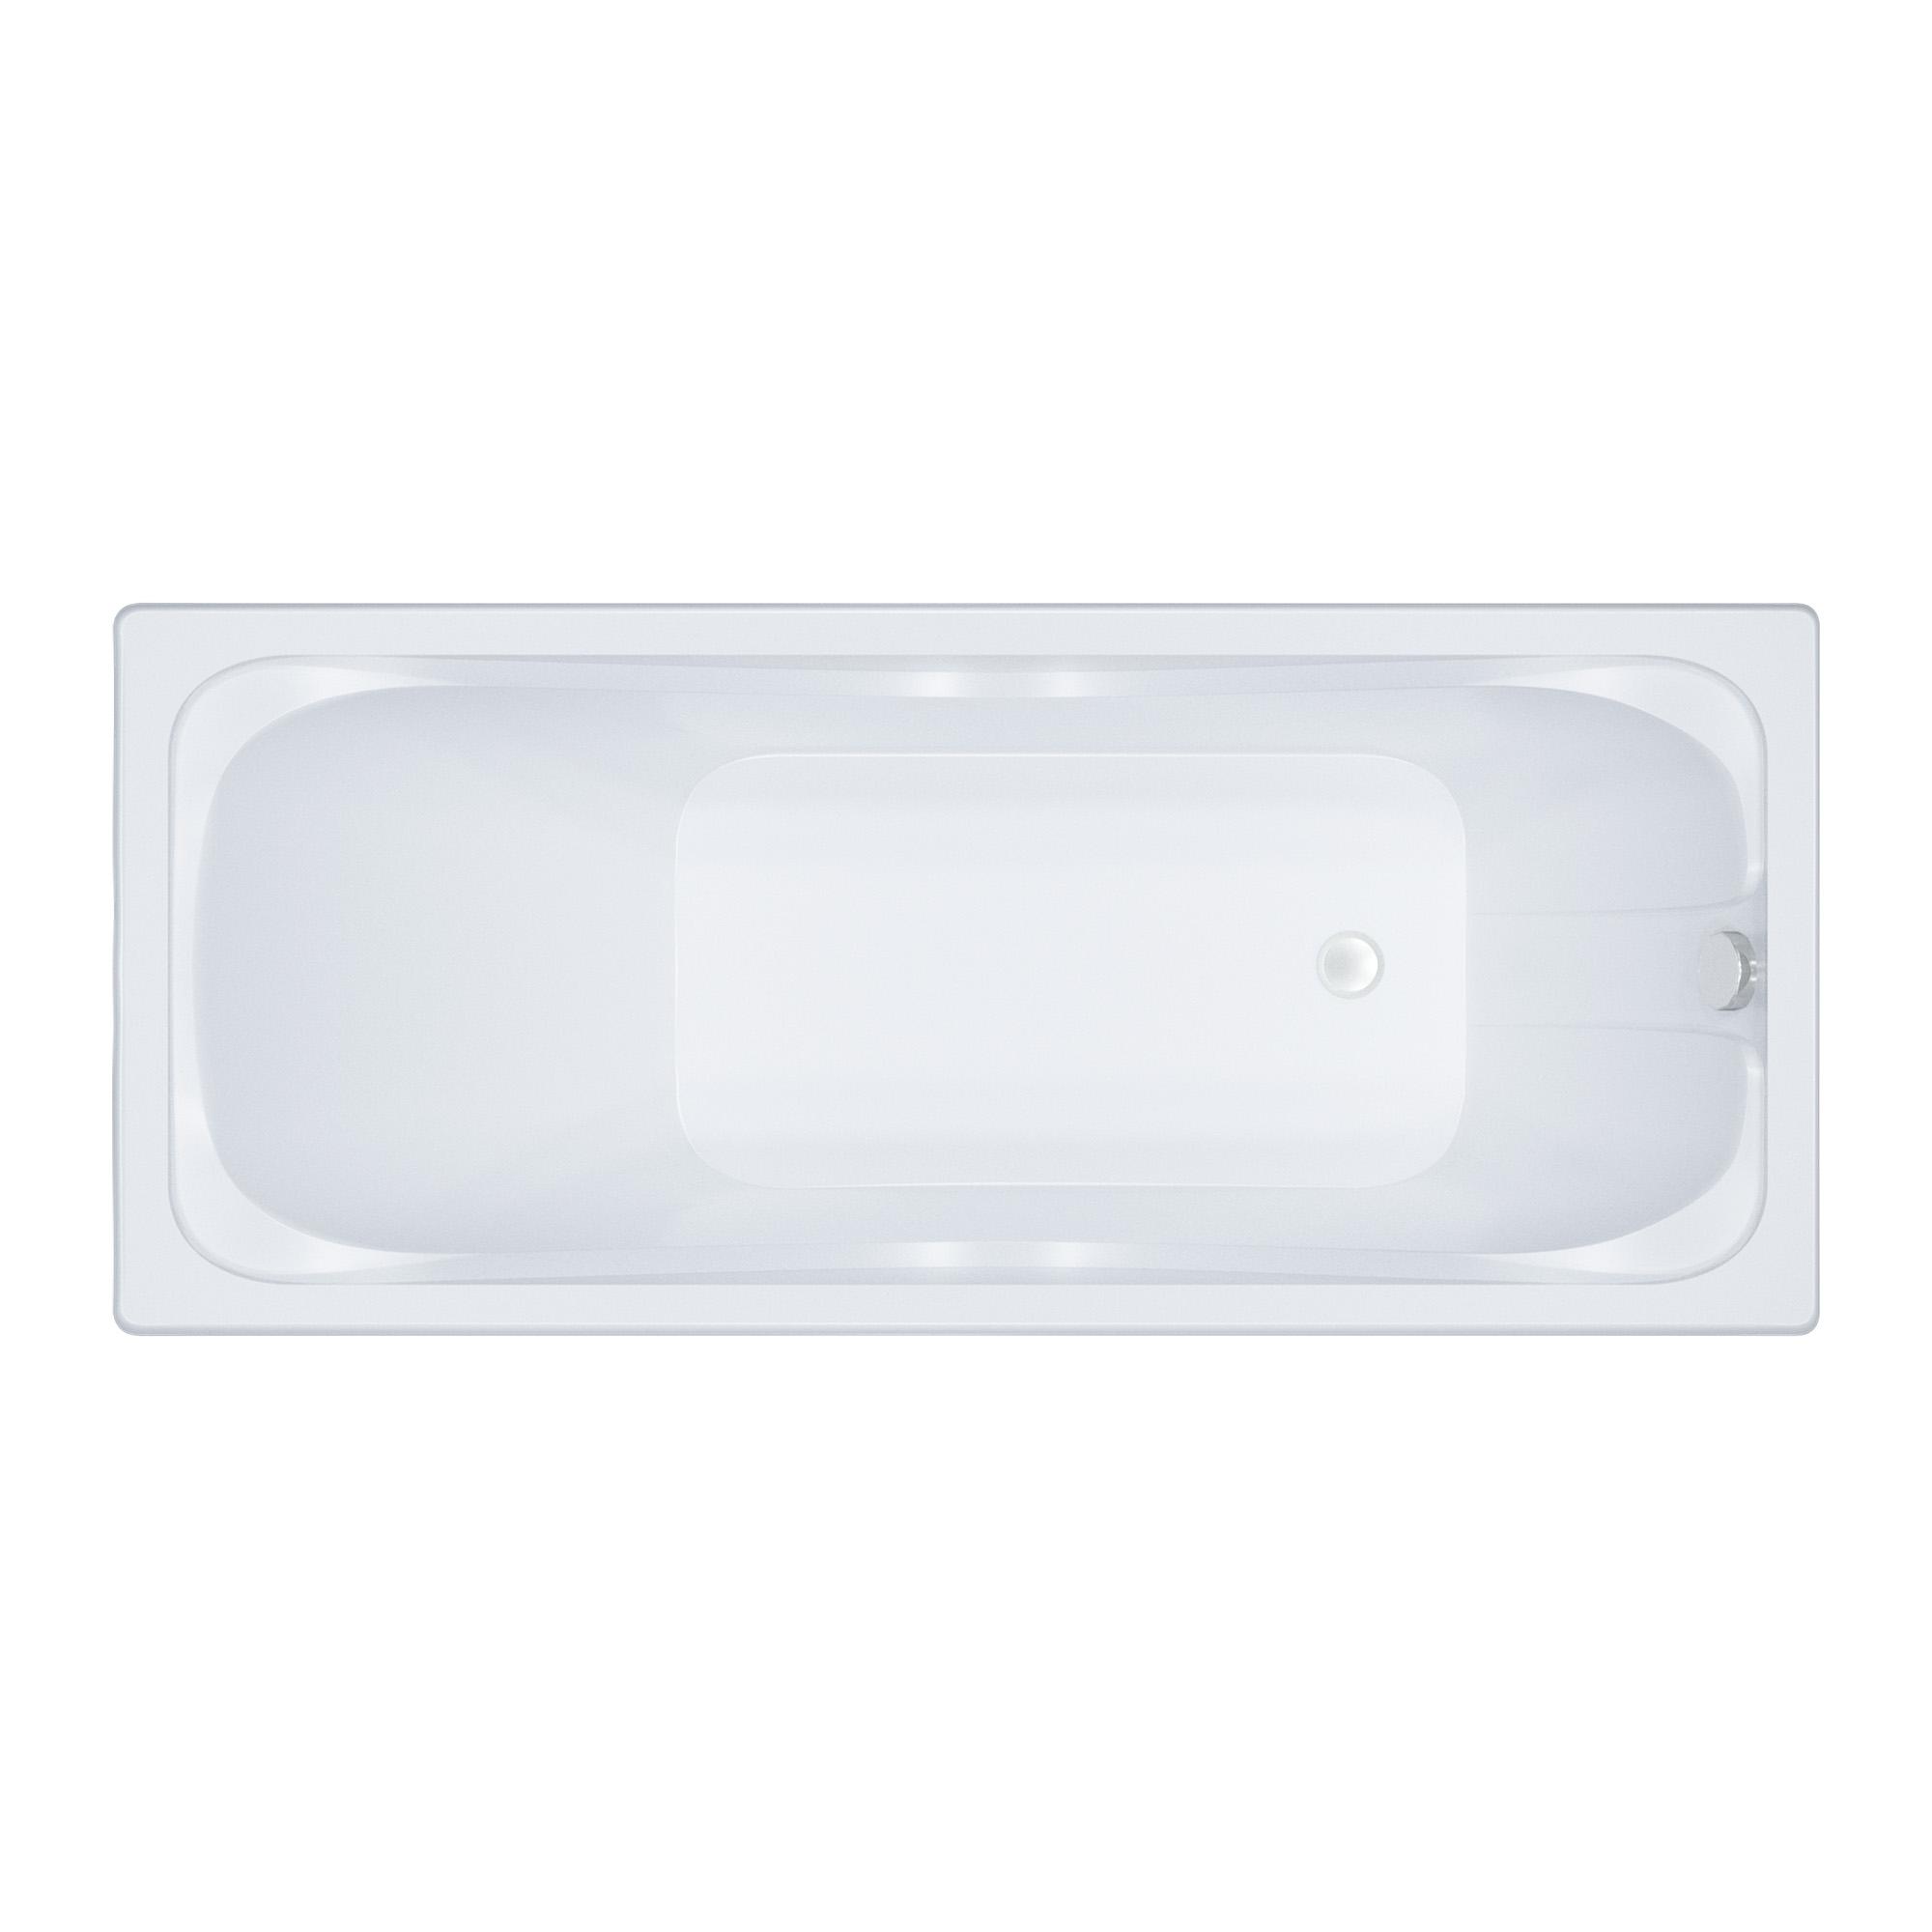 Акриловая ванна Тритон Стандарт 150 экран для ванны triton стандарт 120